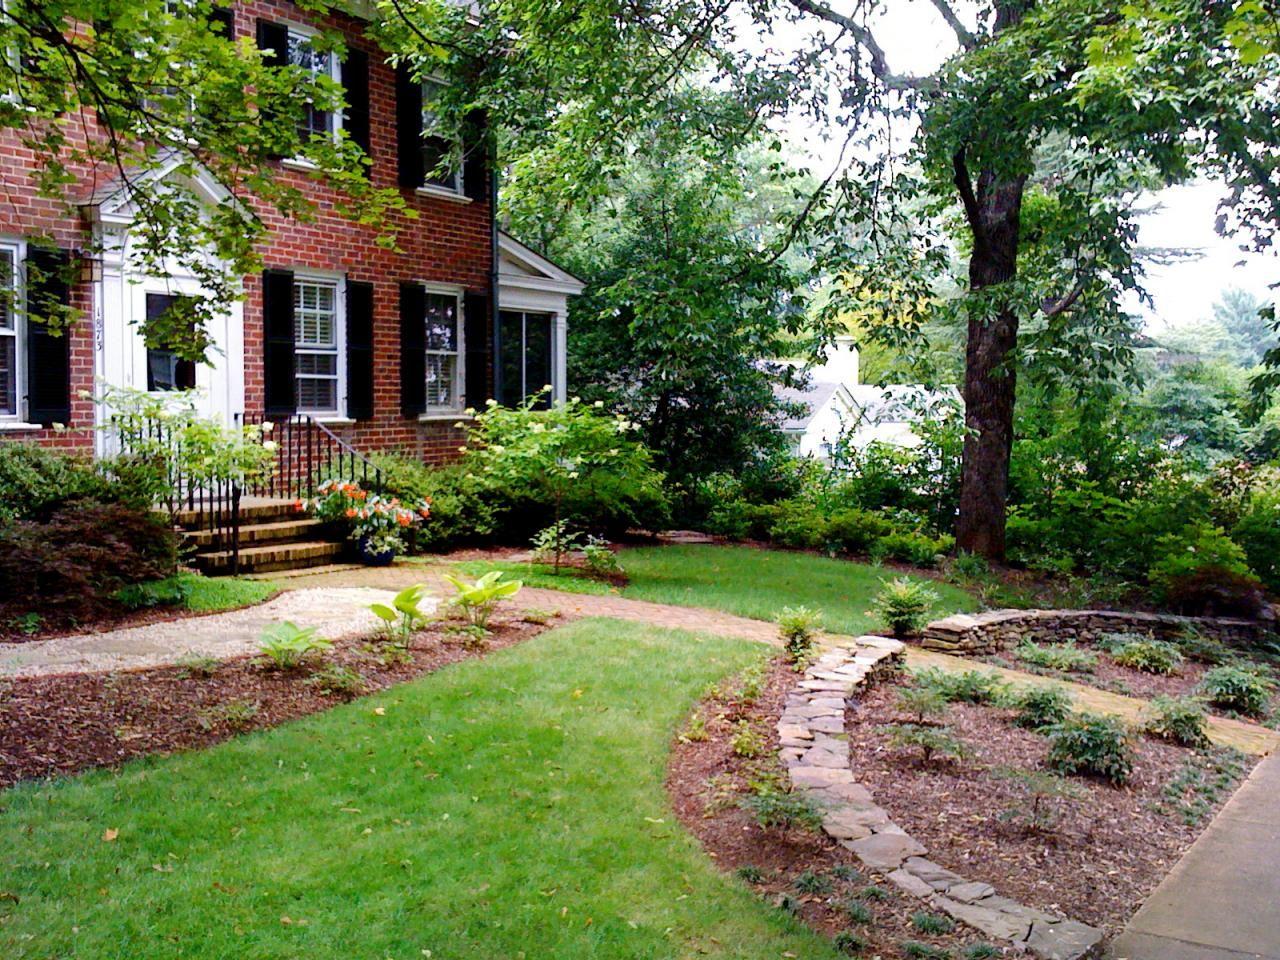 Simple Landscaping Creates An Inviting Elegant Scene